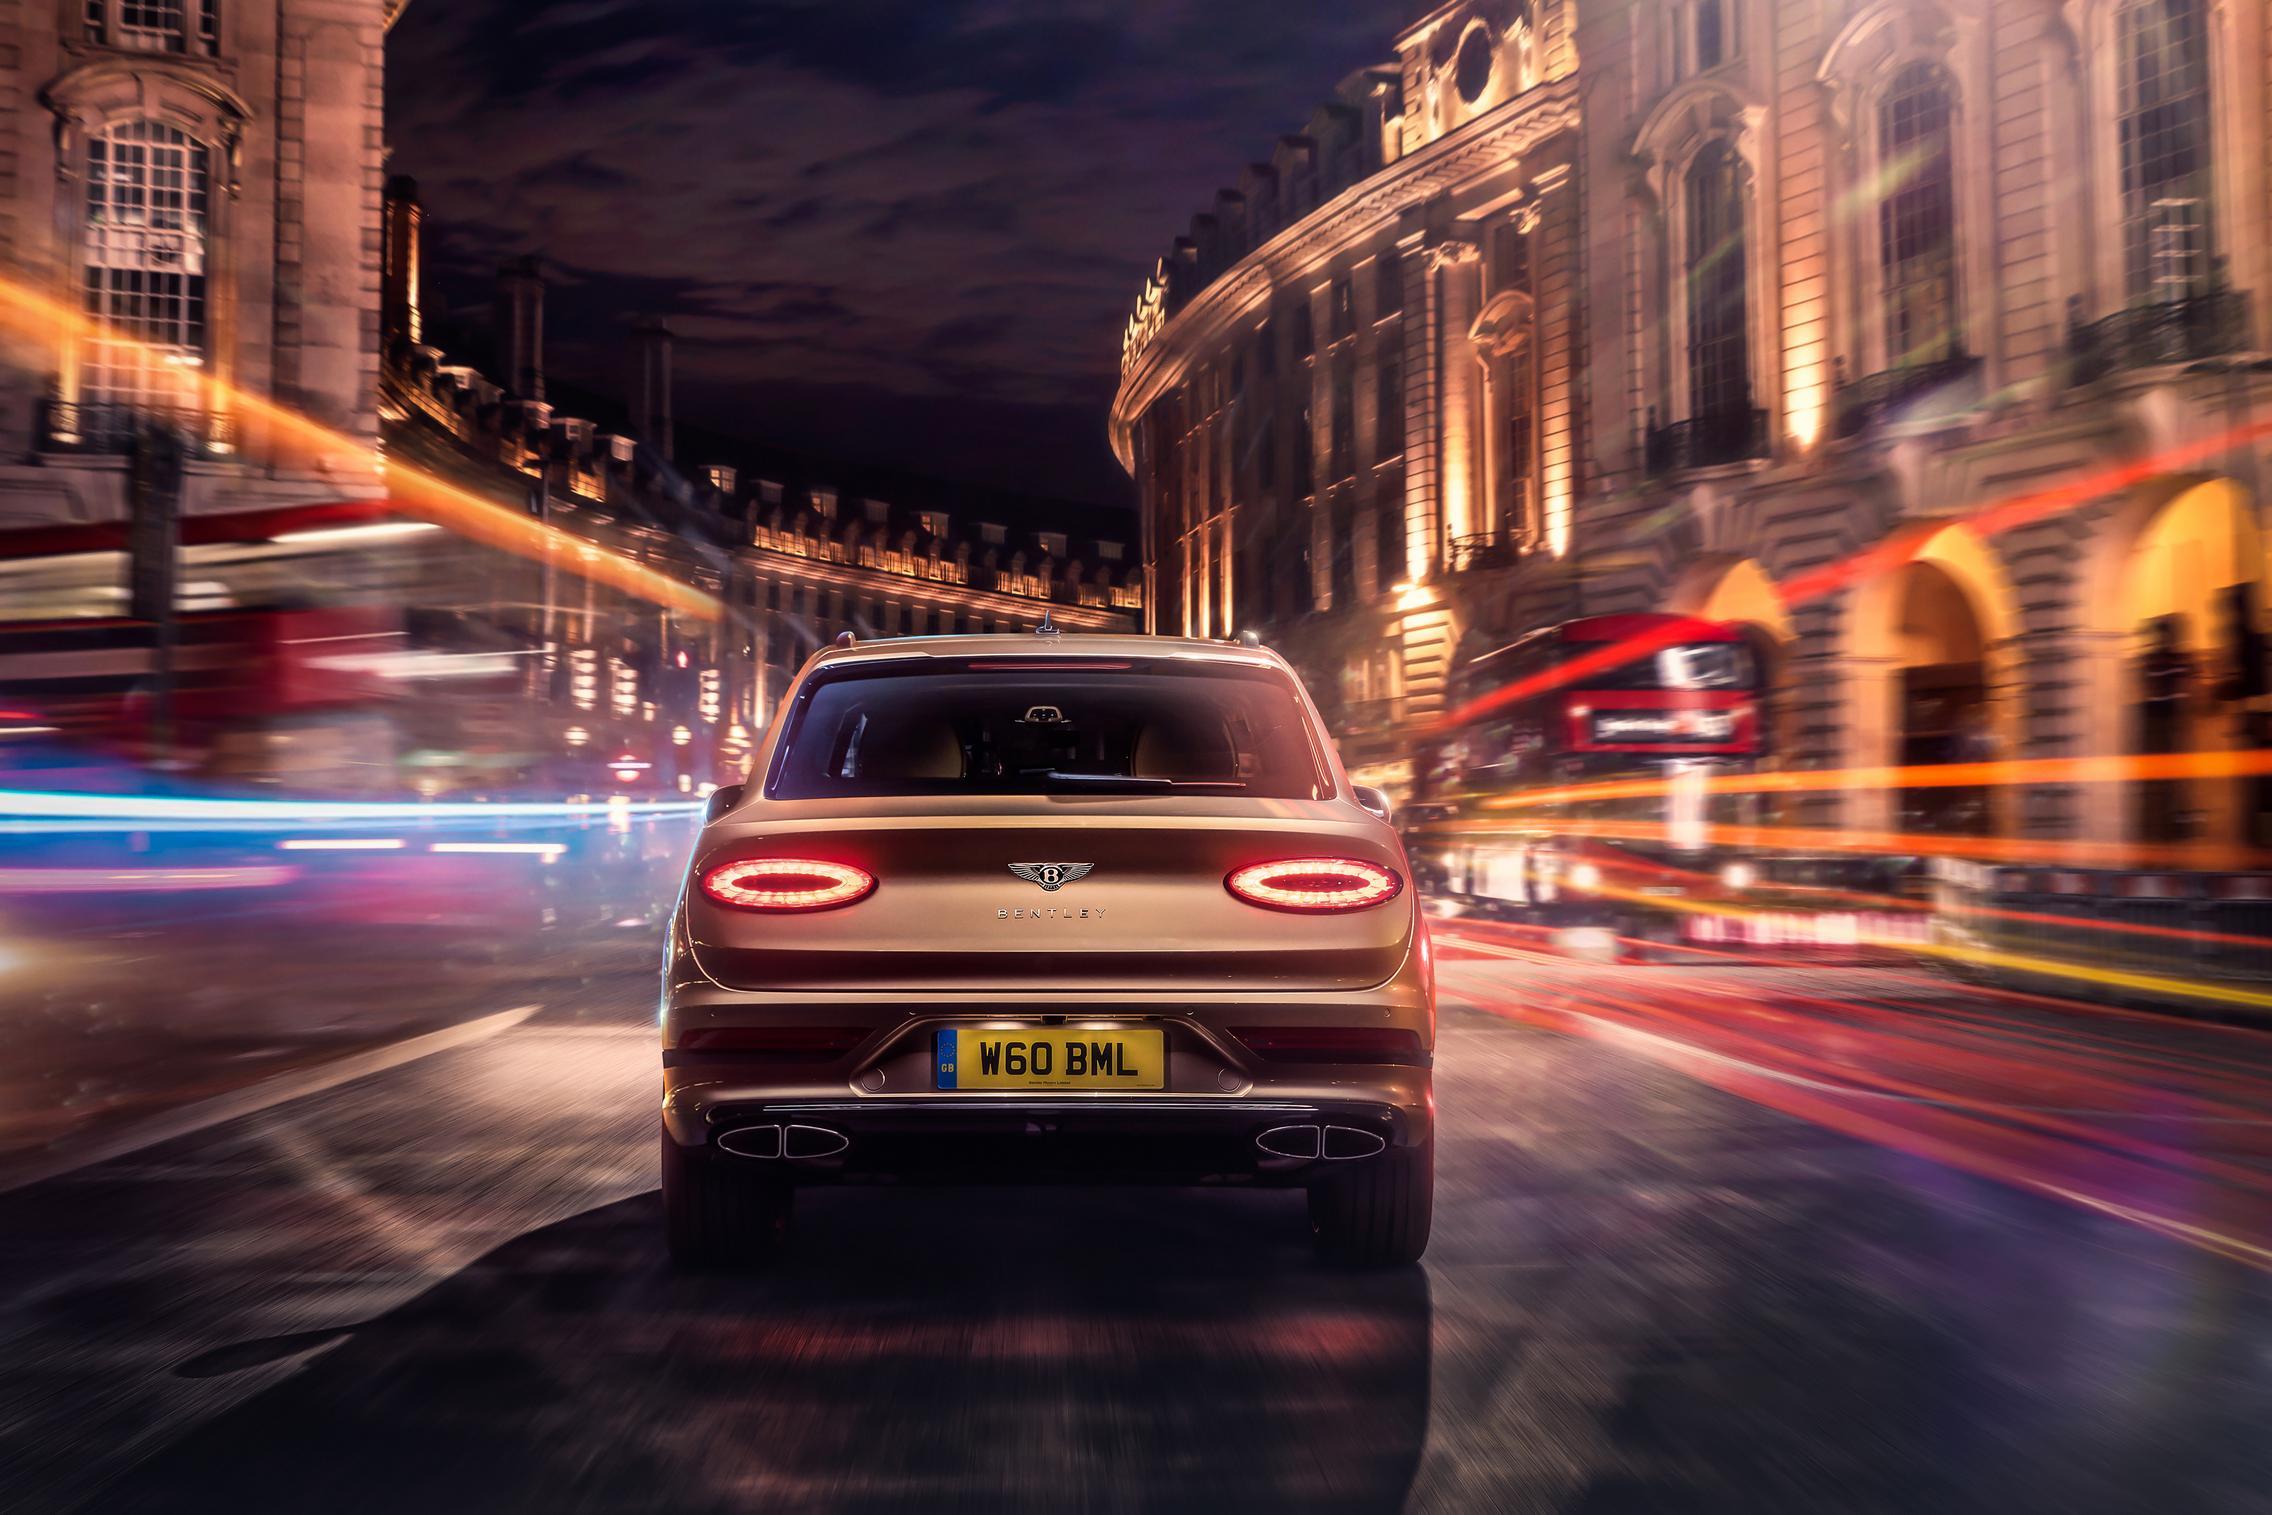 2021 Bentley Bentayga Hybrid rear